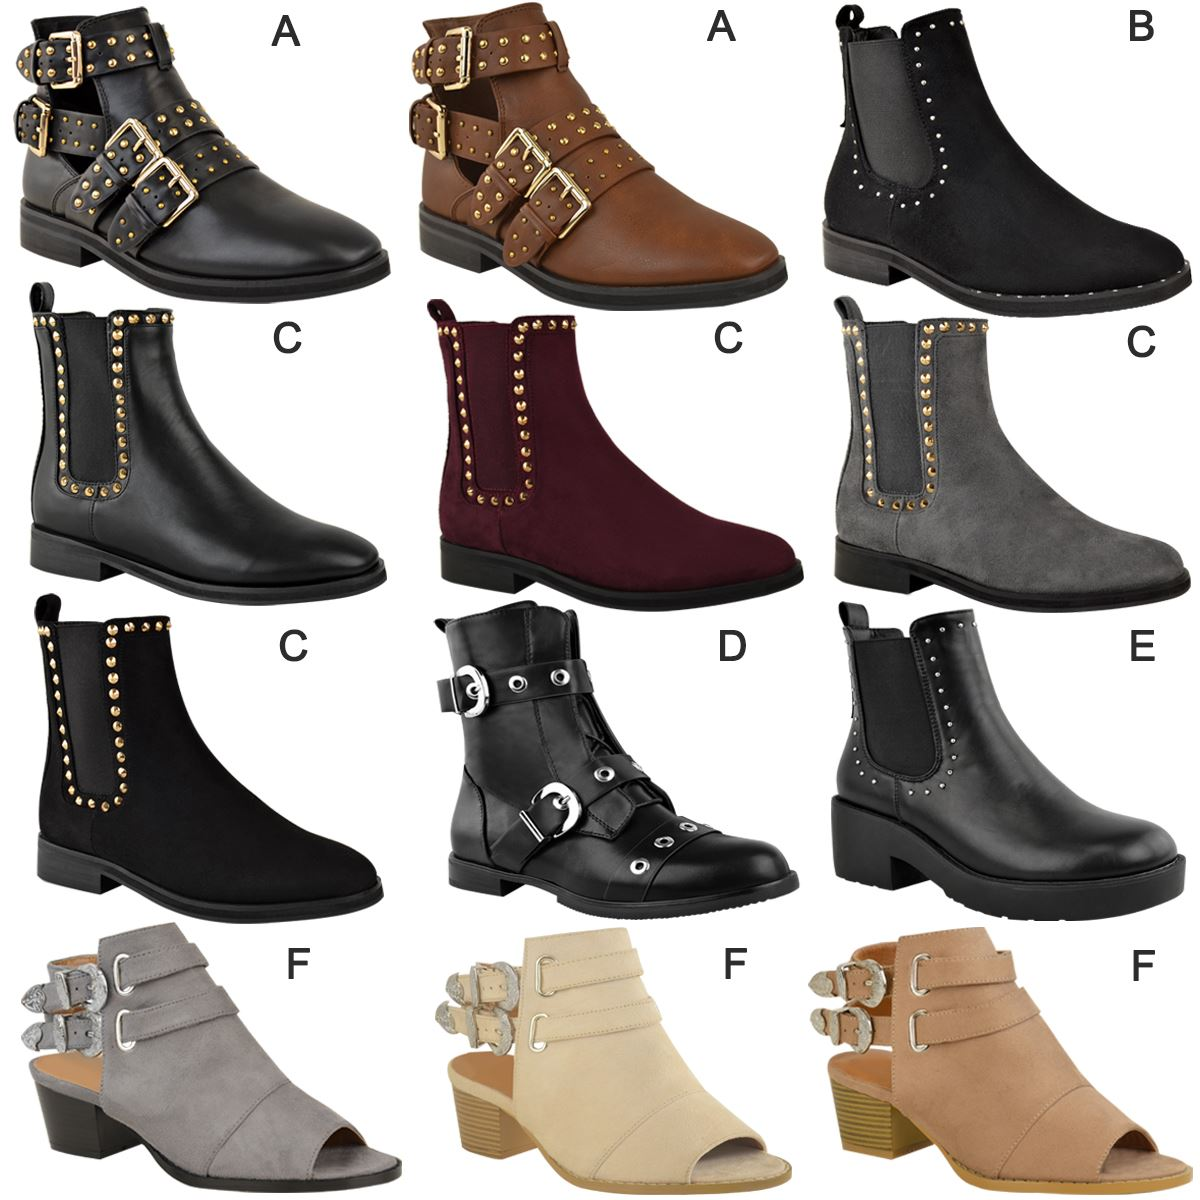 e0028c3c29 Ladies Ankle Low Heel Womens Chelsea Dealer Studded Shoes Boots UK ...